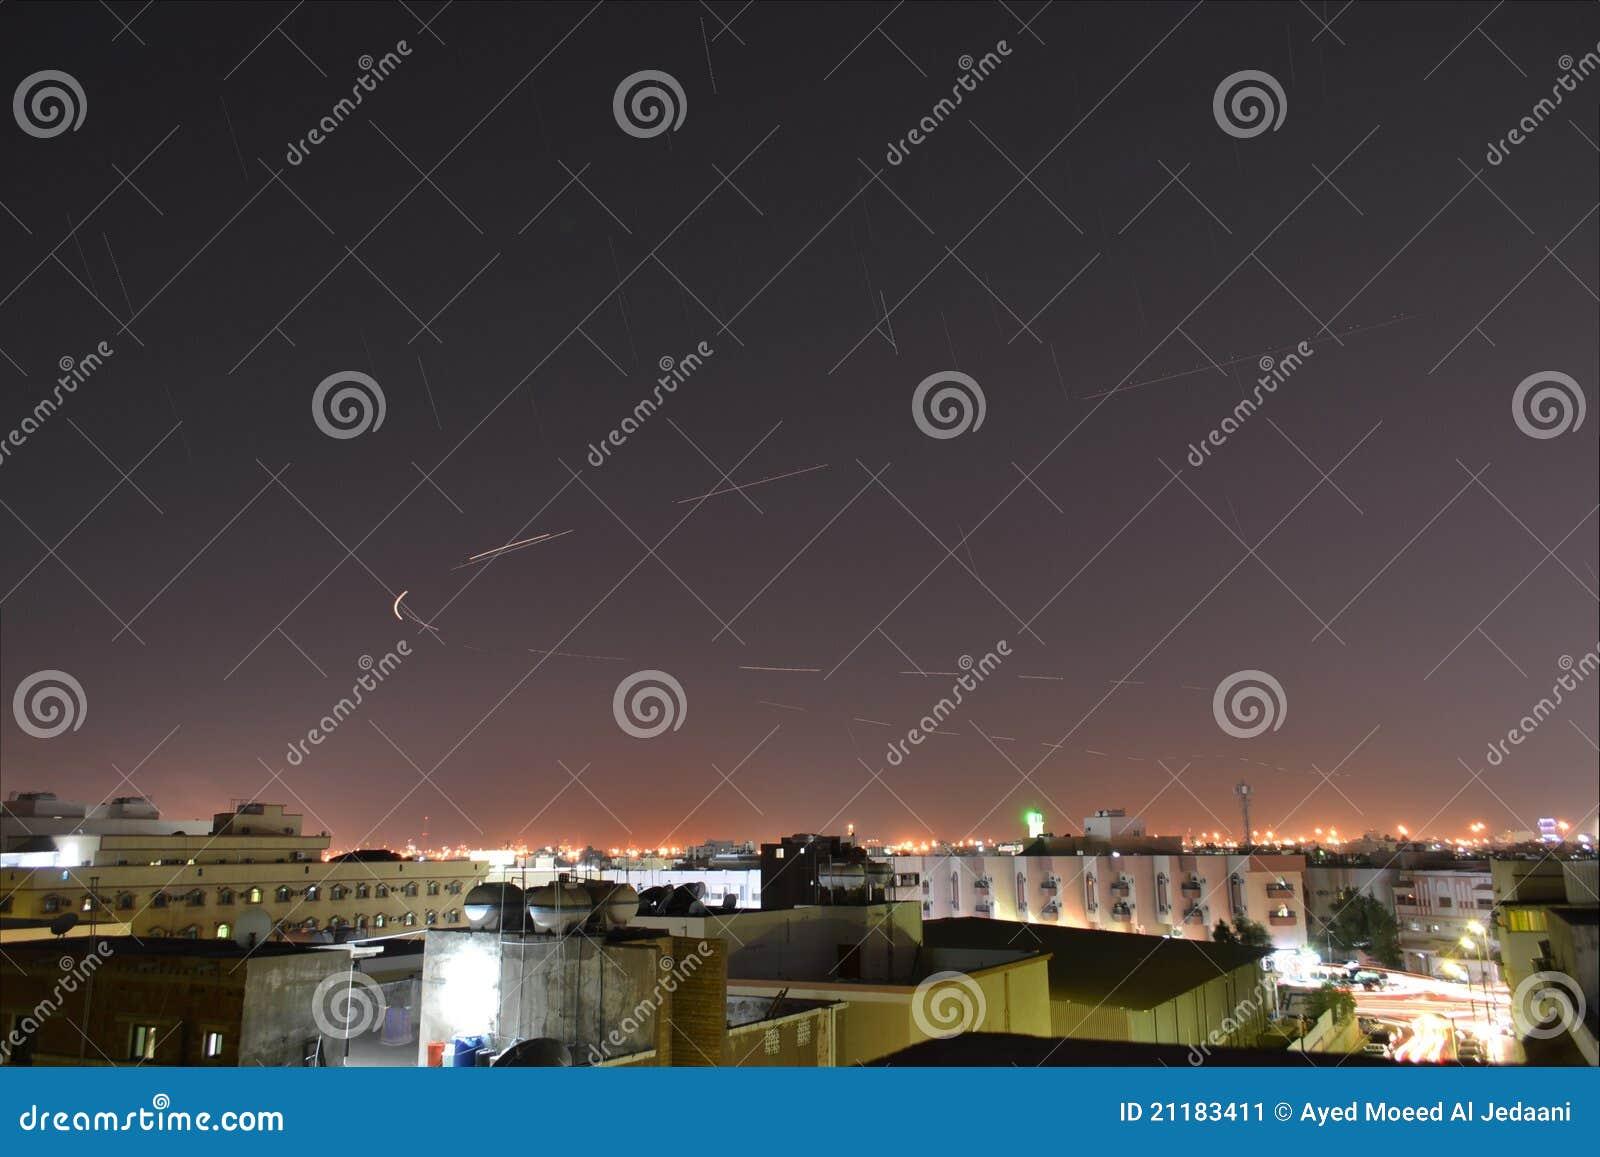 Jeddah at night the stars fall